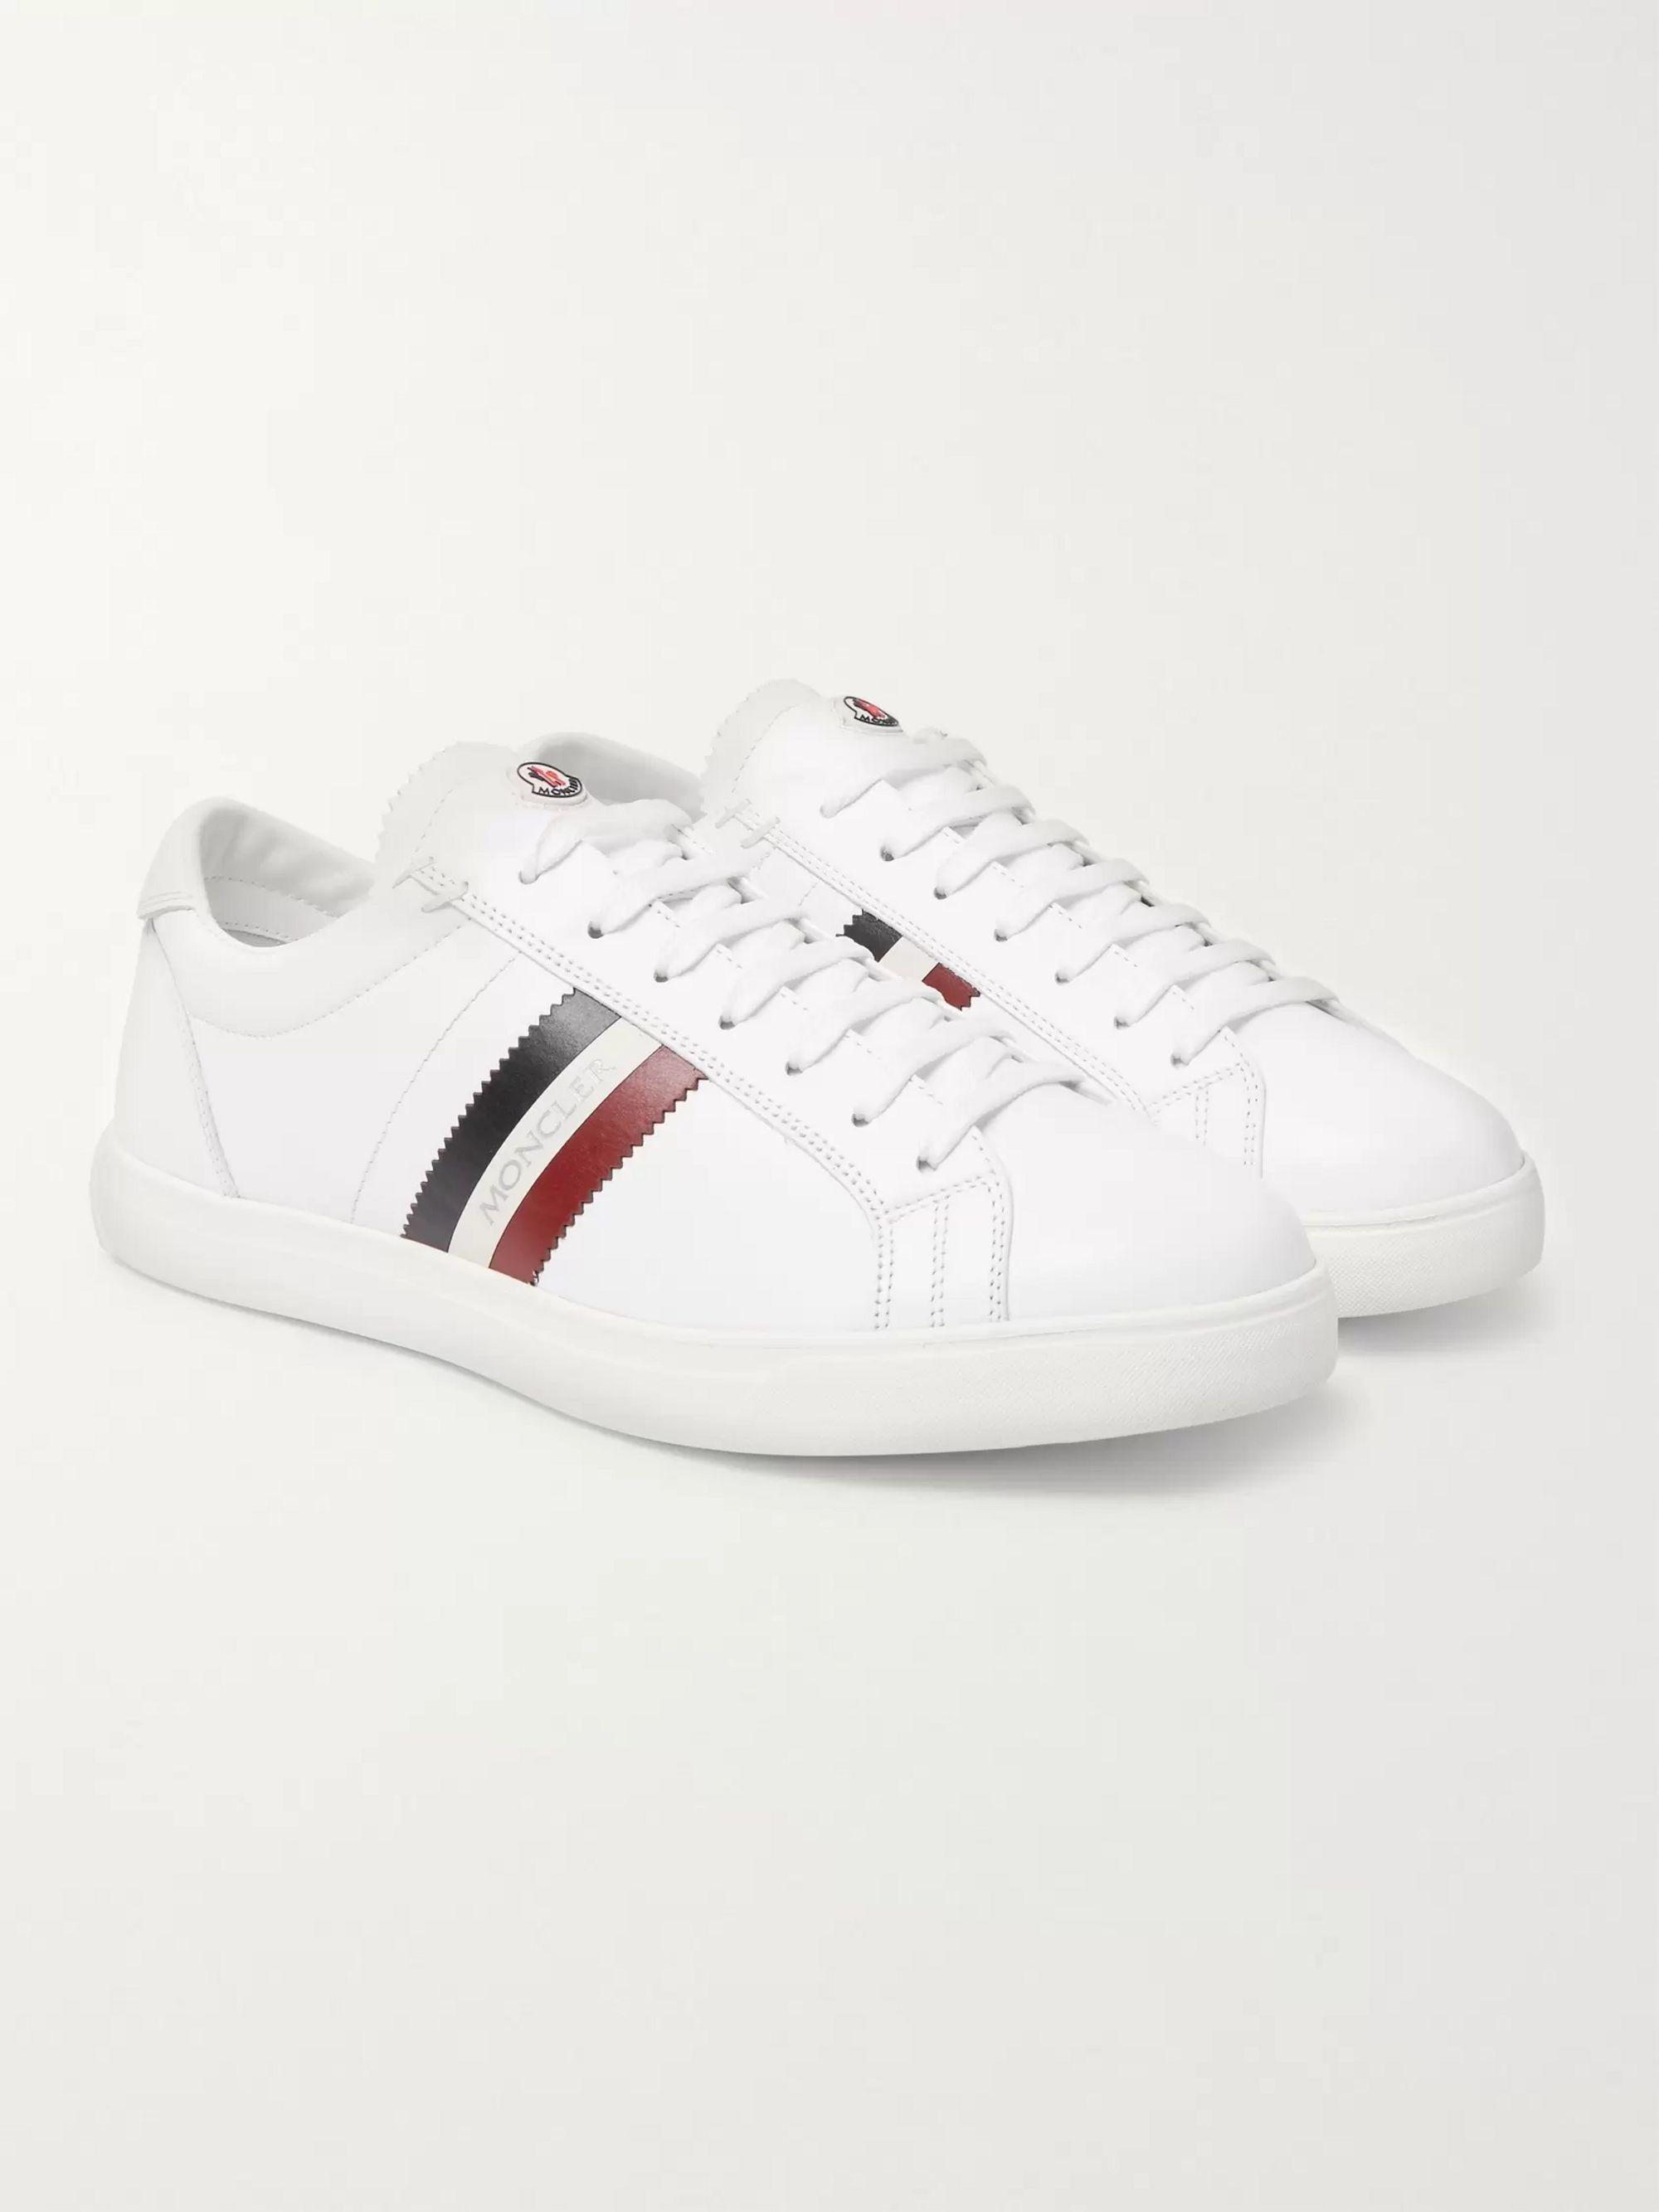 Monaco Striped Leather Sneakers